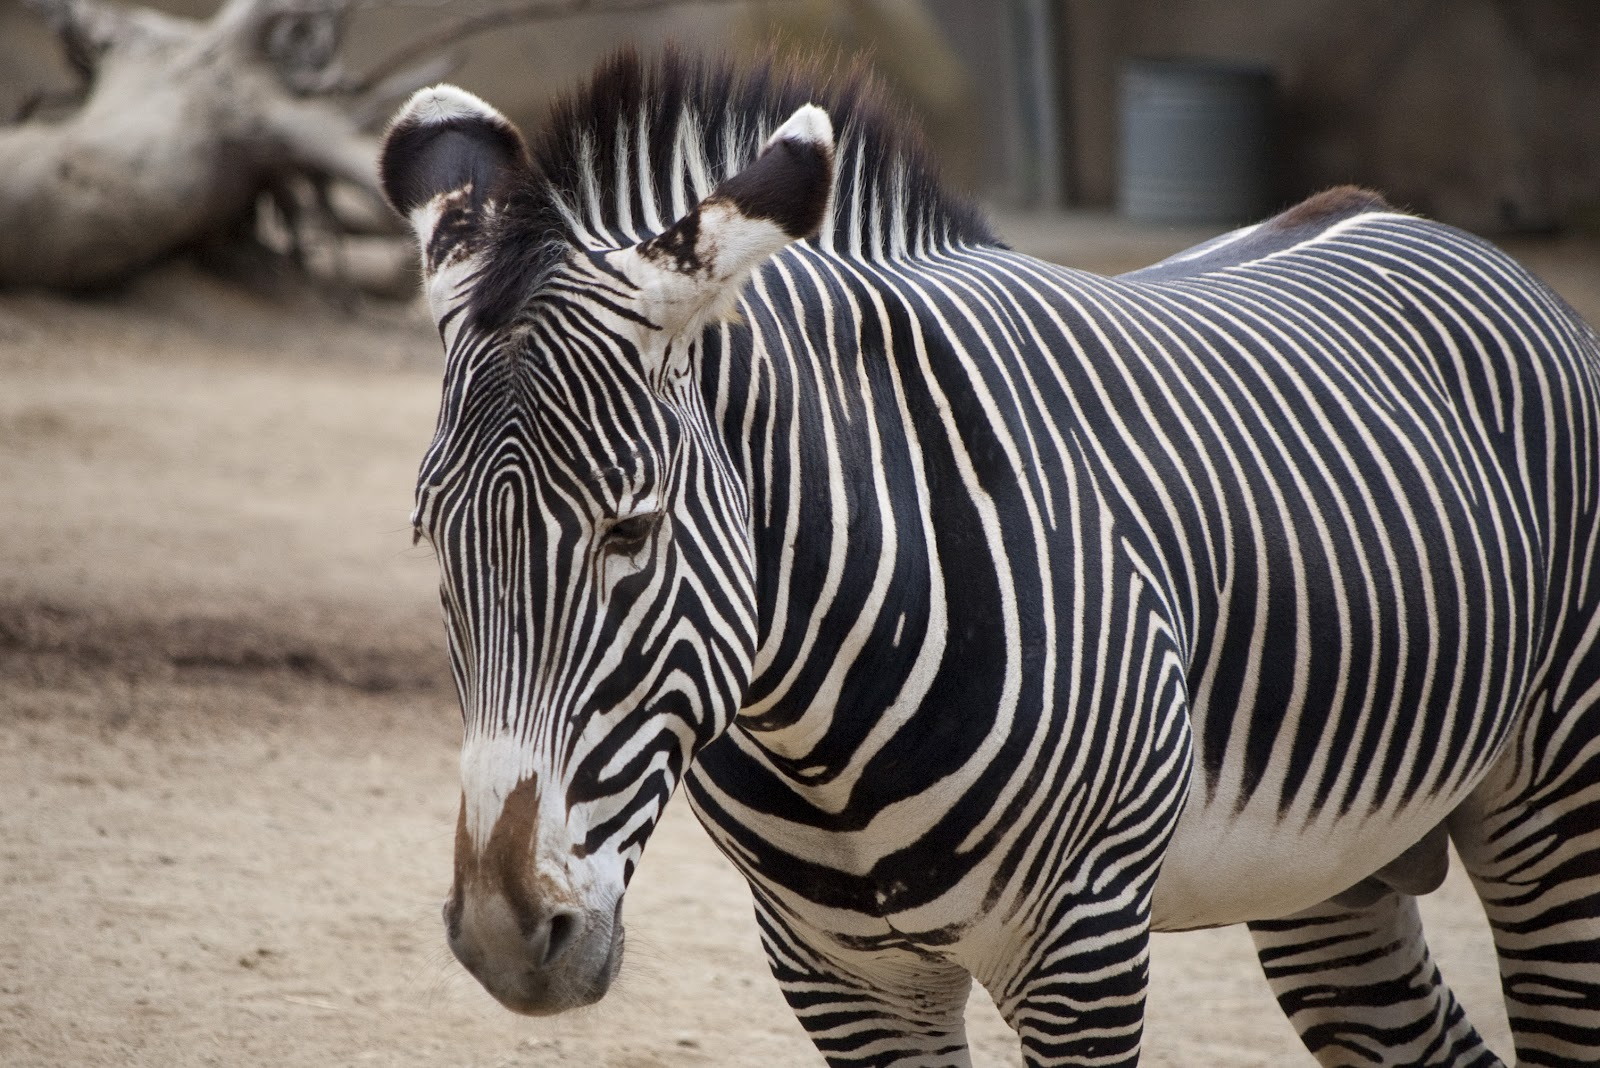 zebra quagga plains zoo equus animal animals facts stripes labels freeimageslive grevy distinctive equidae grevys definition wildlife gr